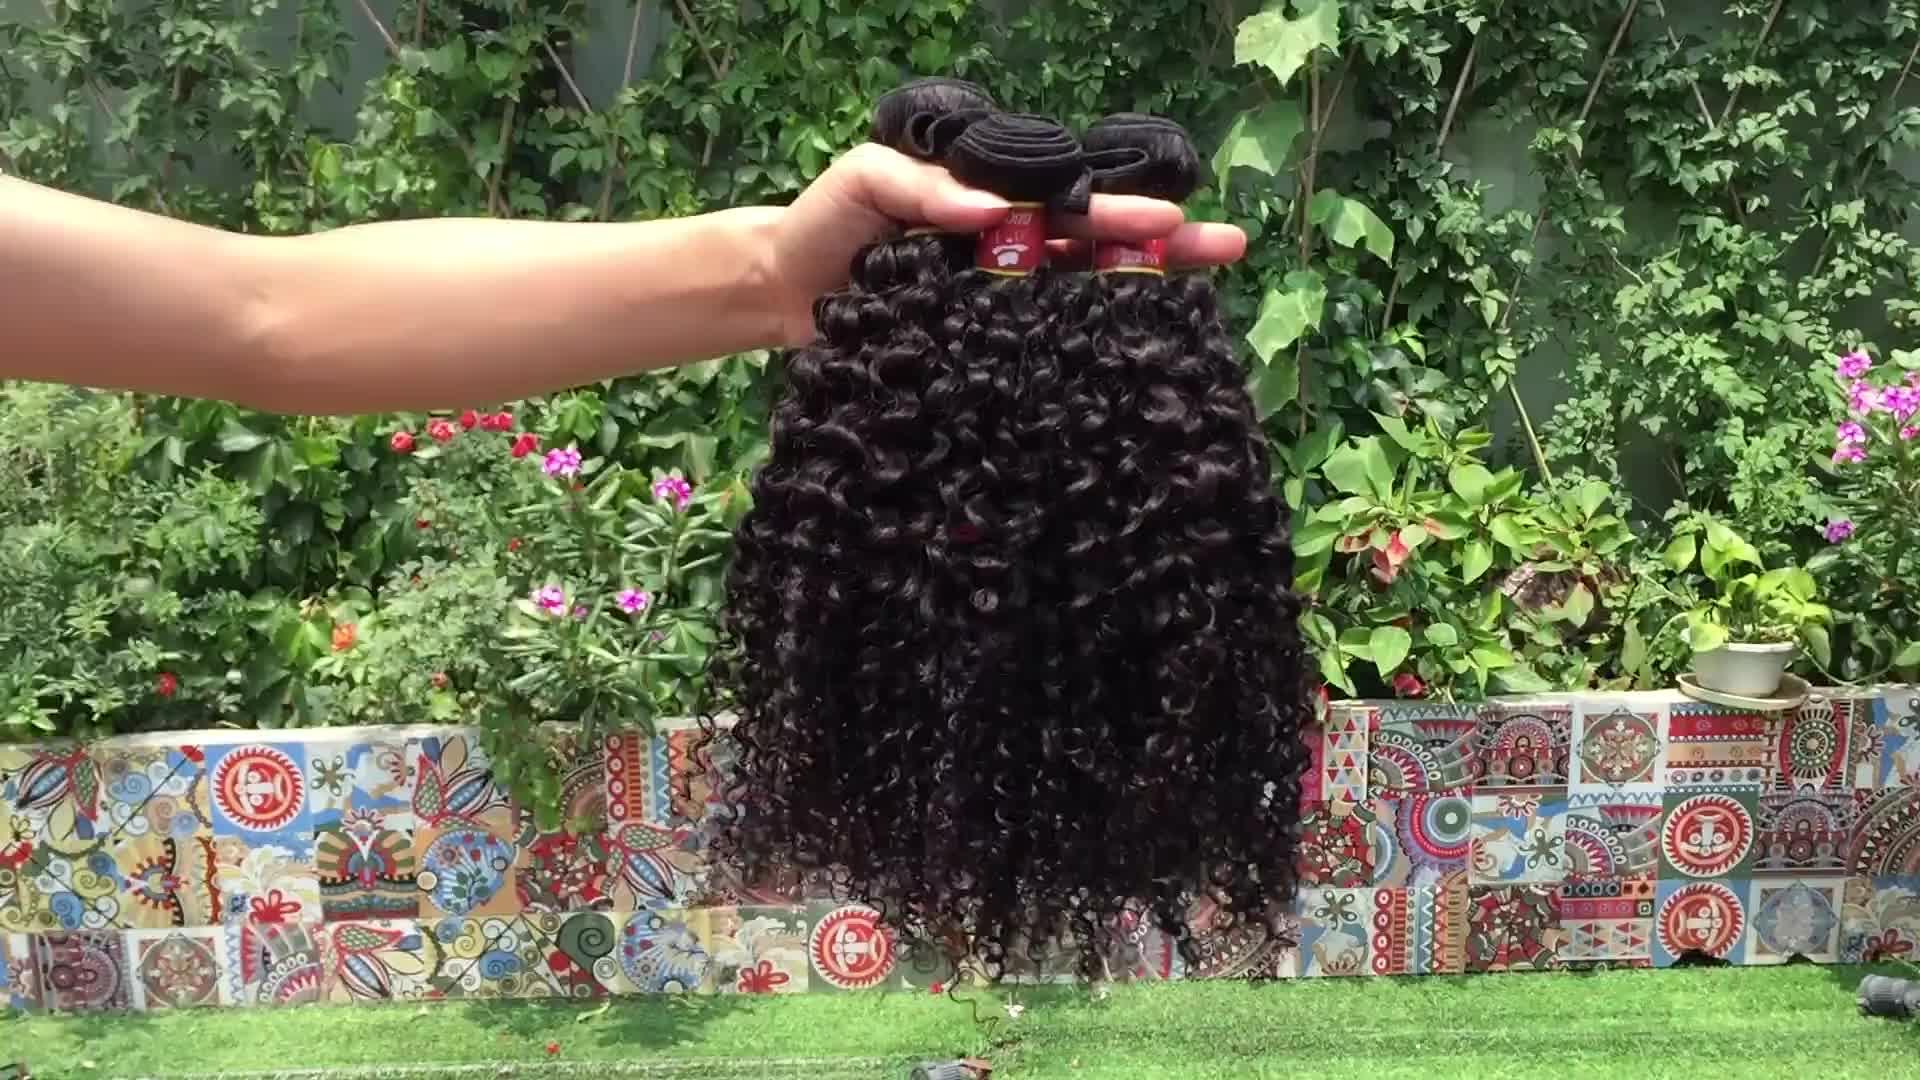 Cuticle aligned ด้านบนดิบ virgin พม่า curly ผม vendor, ขายส่งพม่า virgin hair, 4c afro kinky curly remy มนุษย์ผมสาน